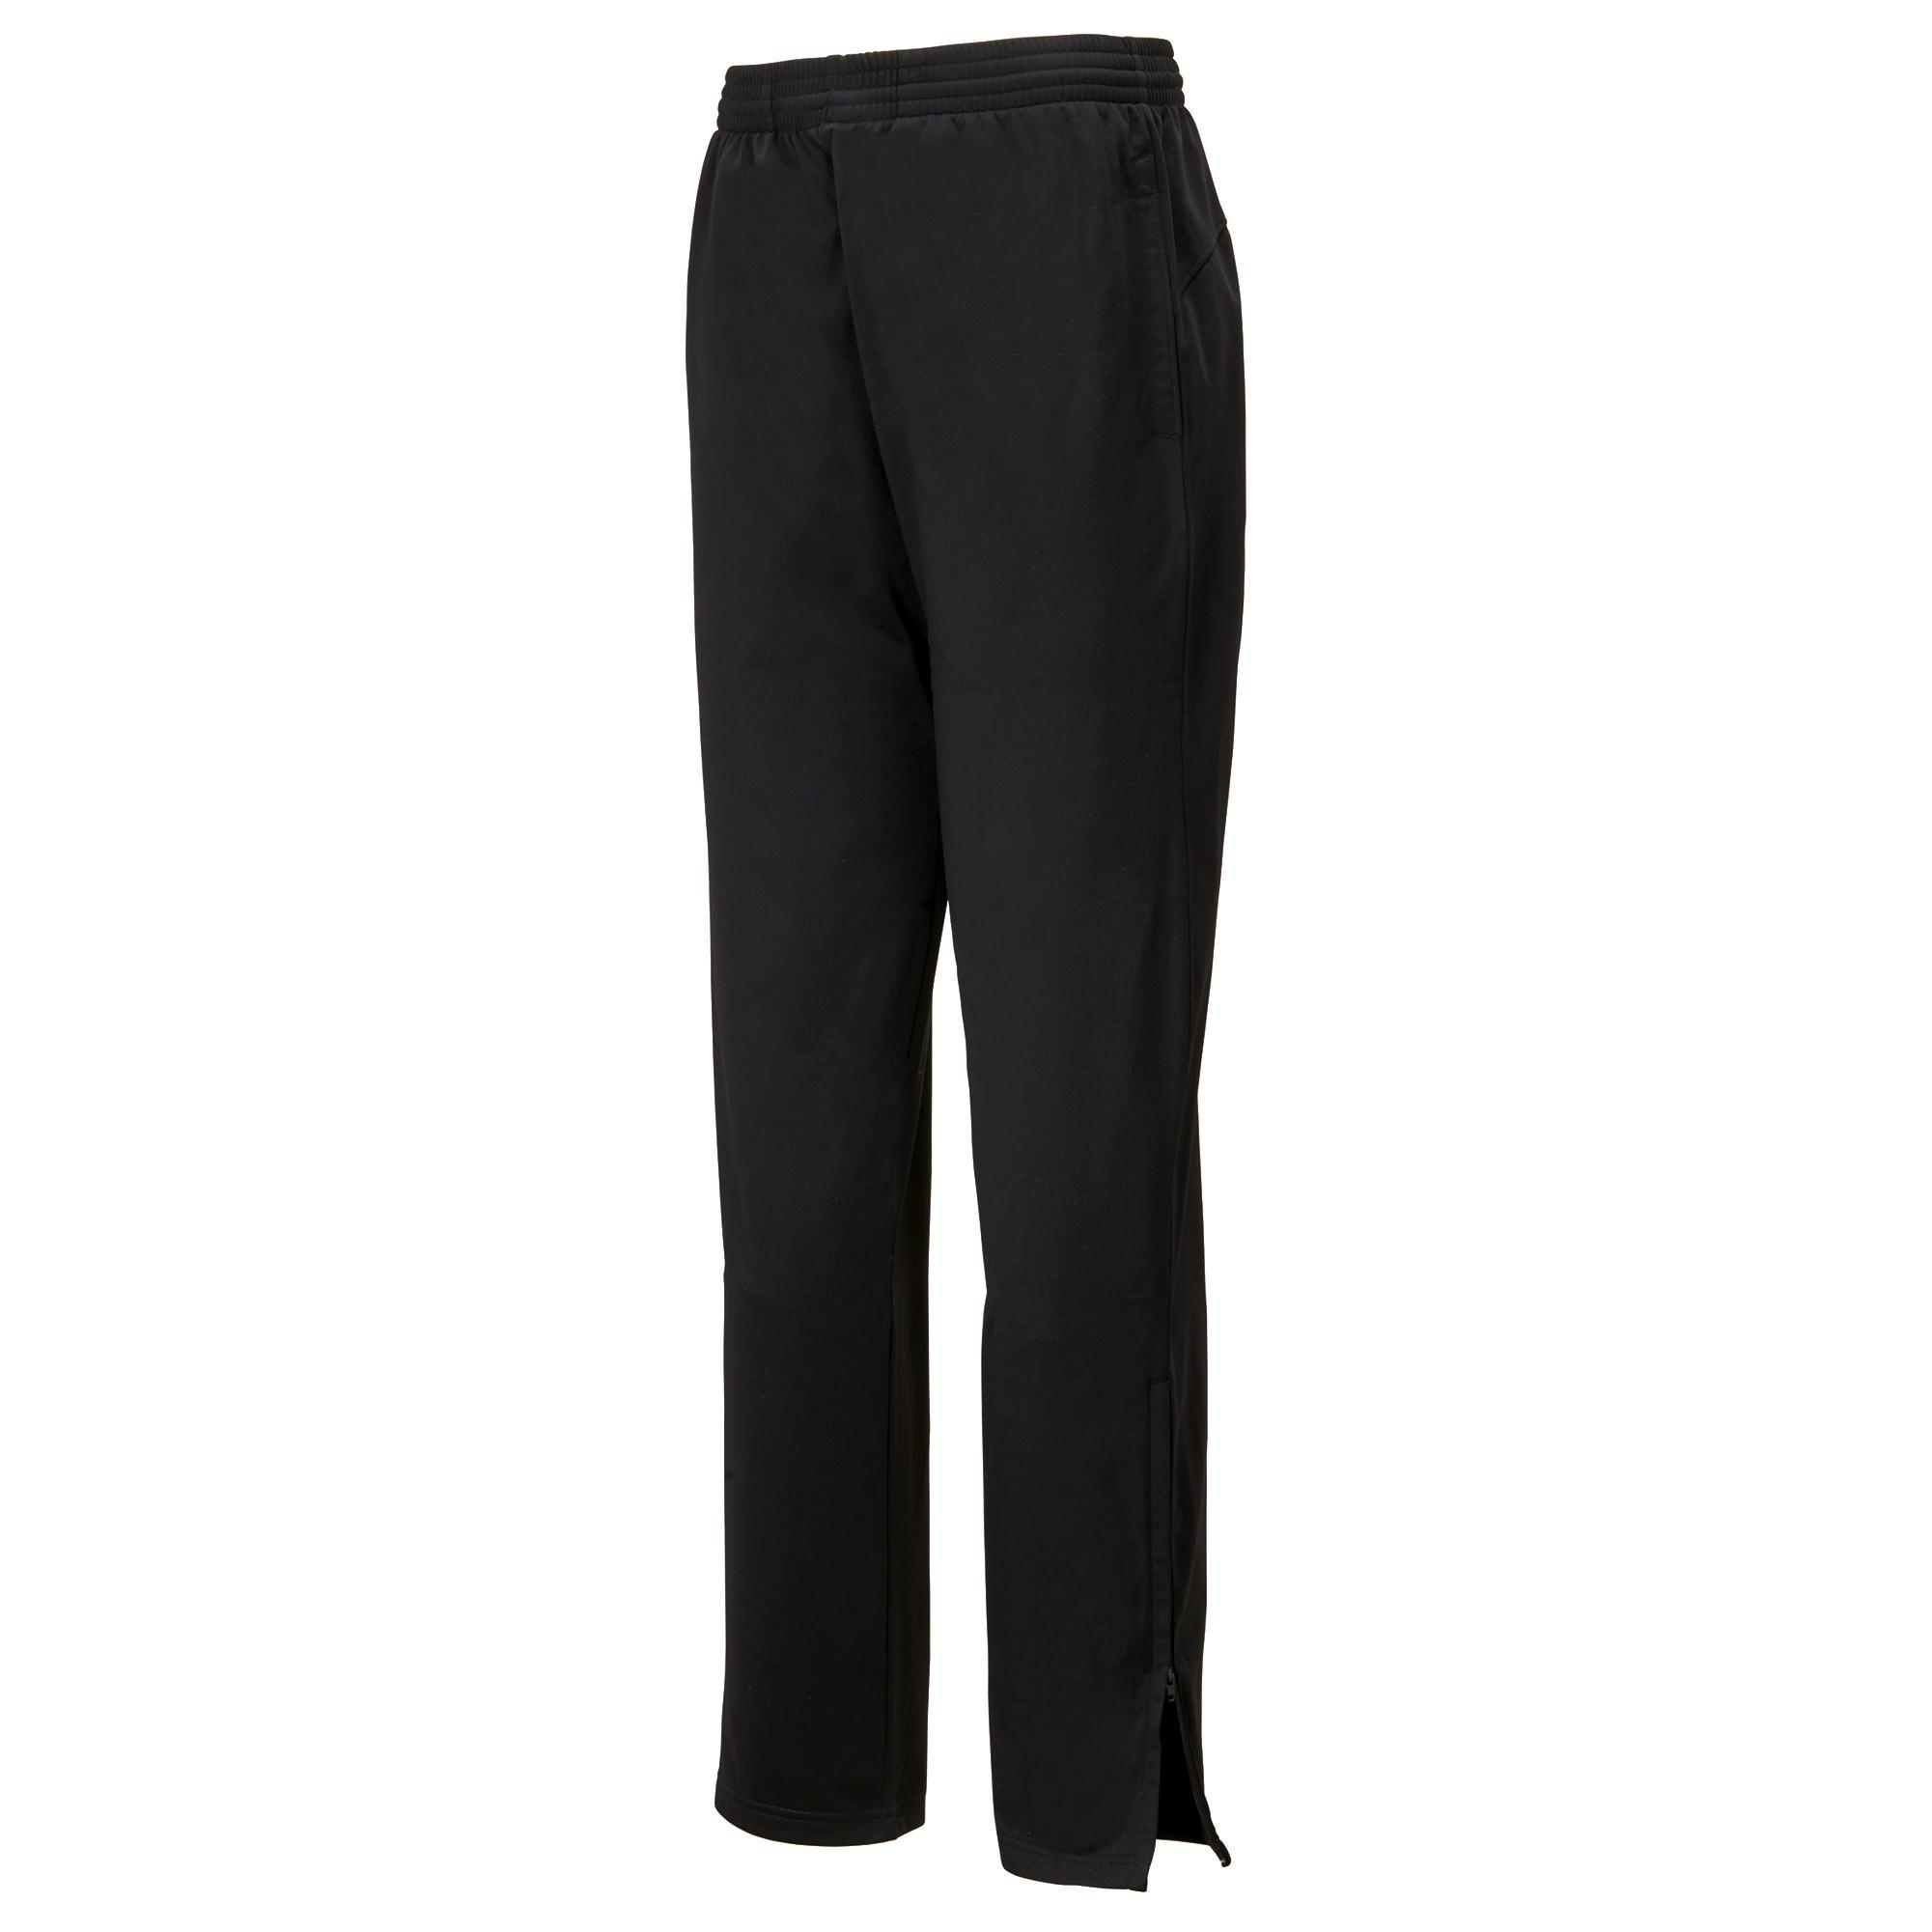 Style 7726 Pants